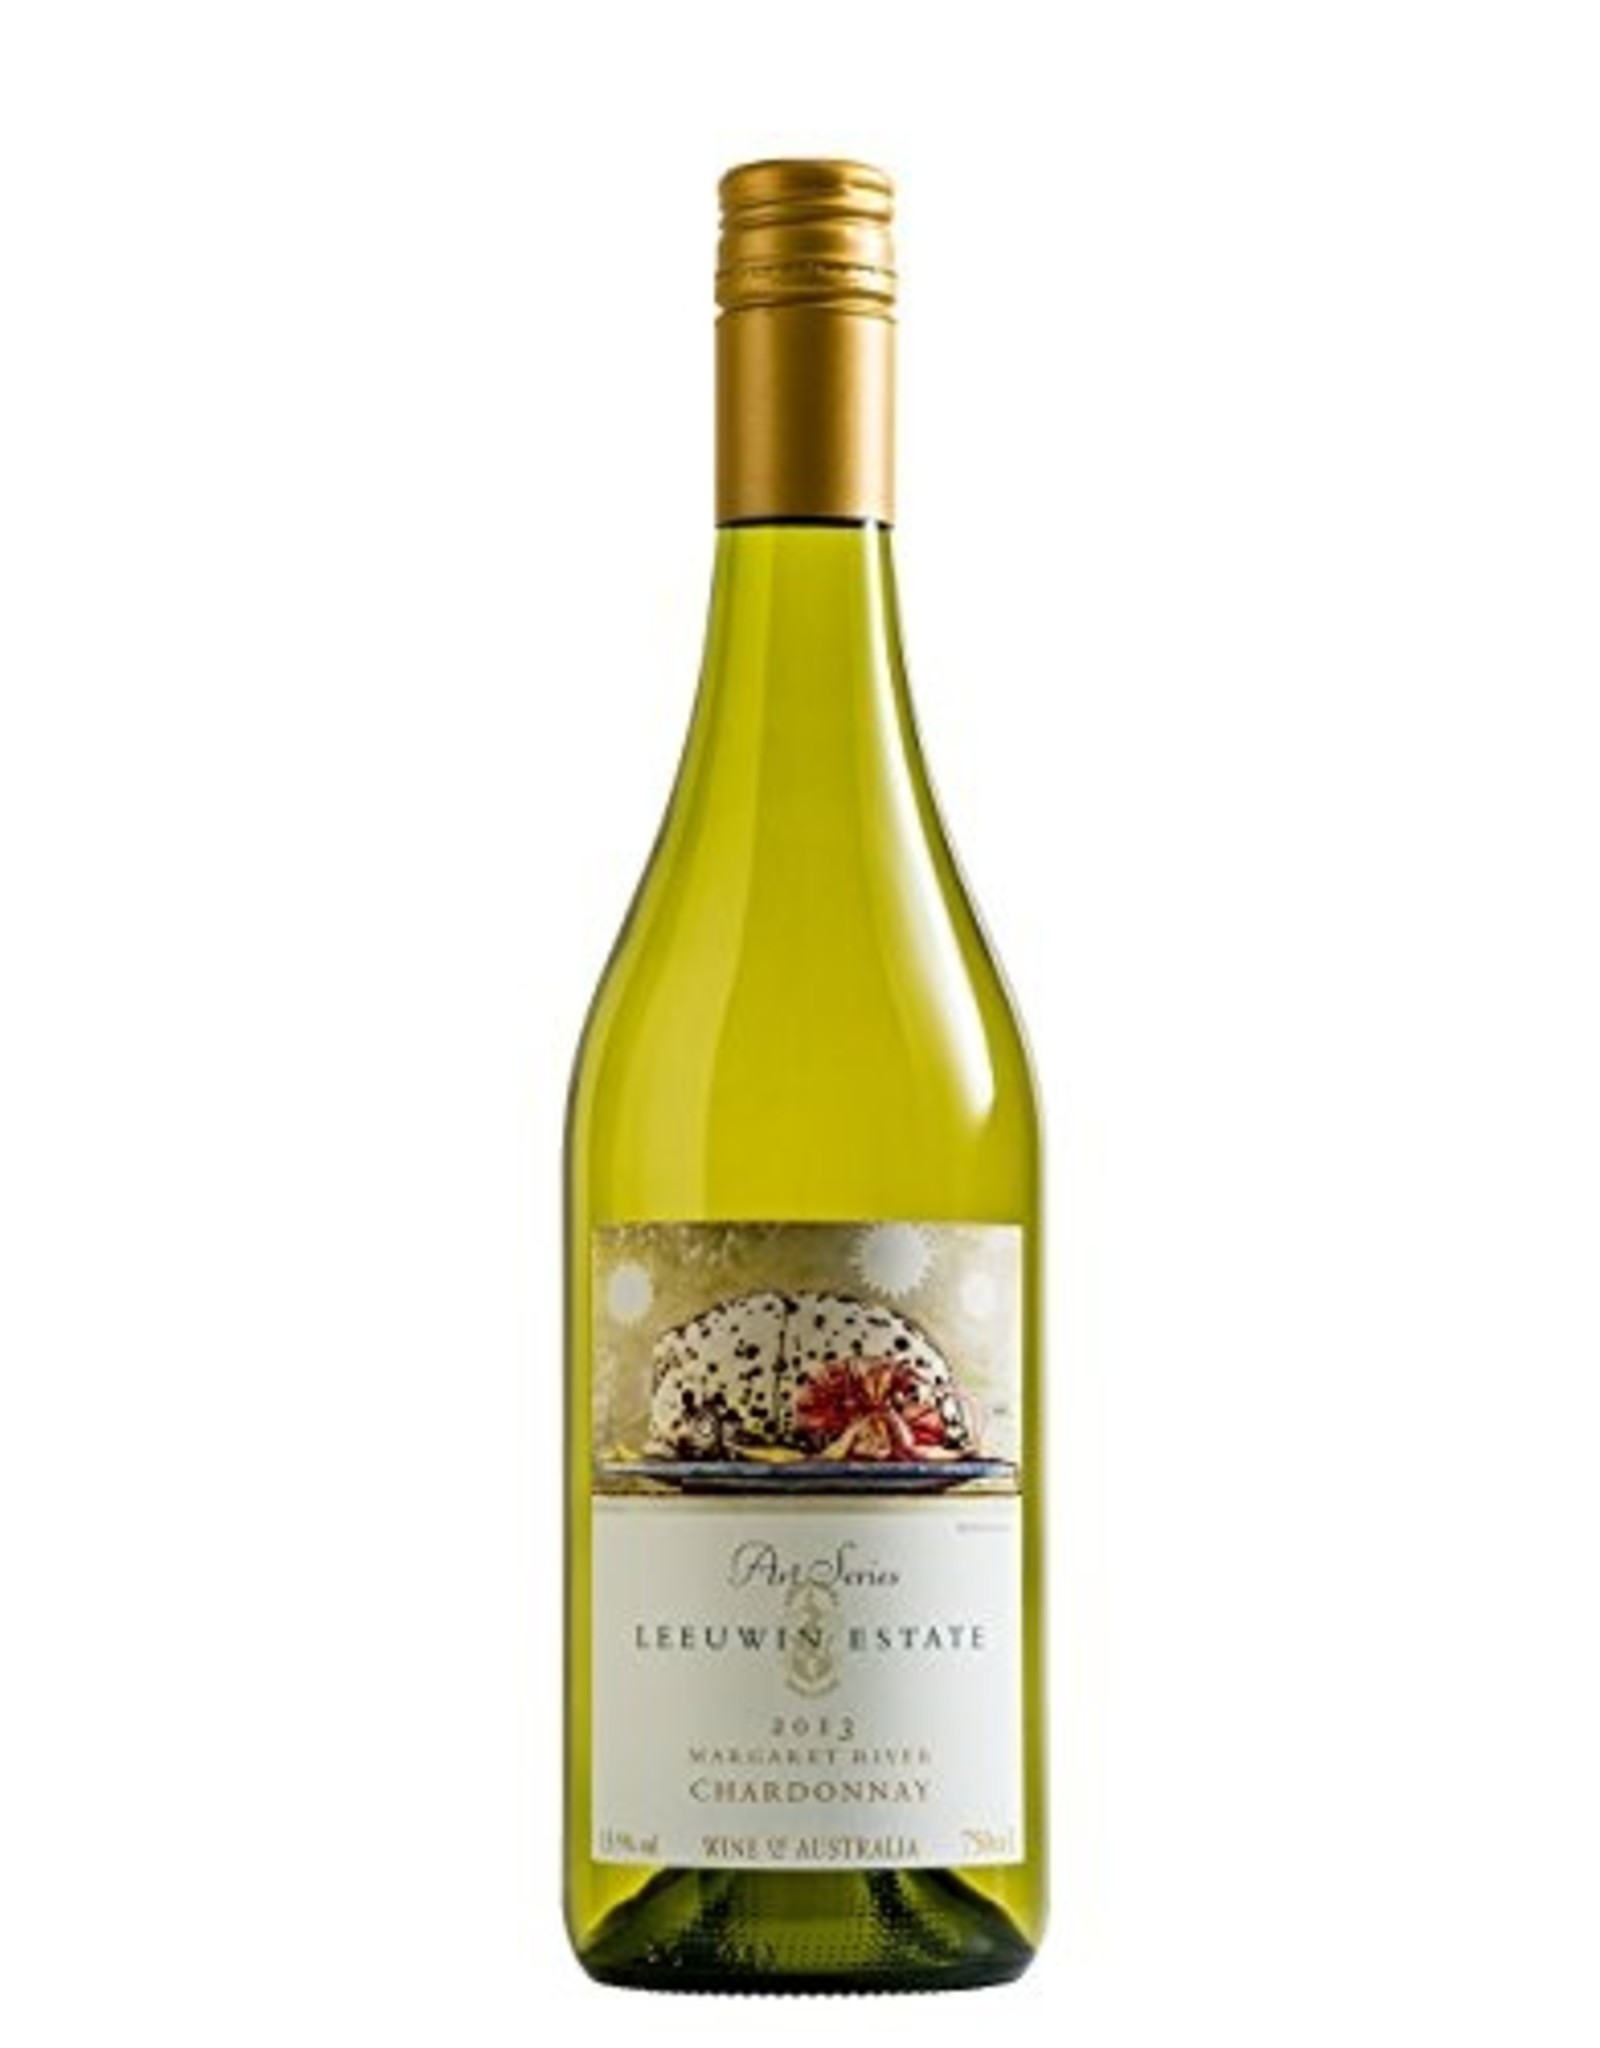 White Wine 2013, Leeuwin Estate Art Series, Chardonnay, Margret River, Western Australia, Australia, 13.5% Alc, CT92, RP95